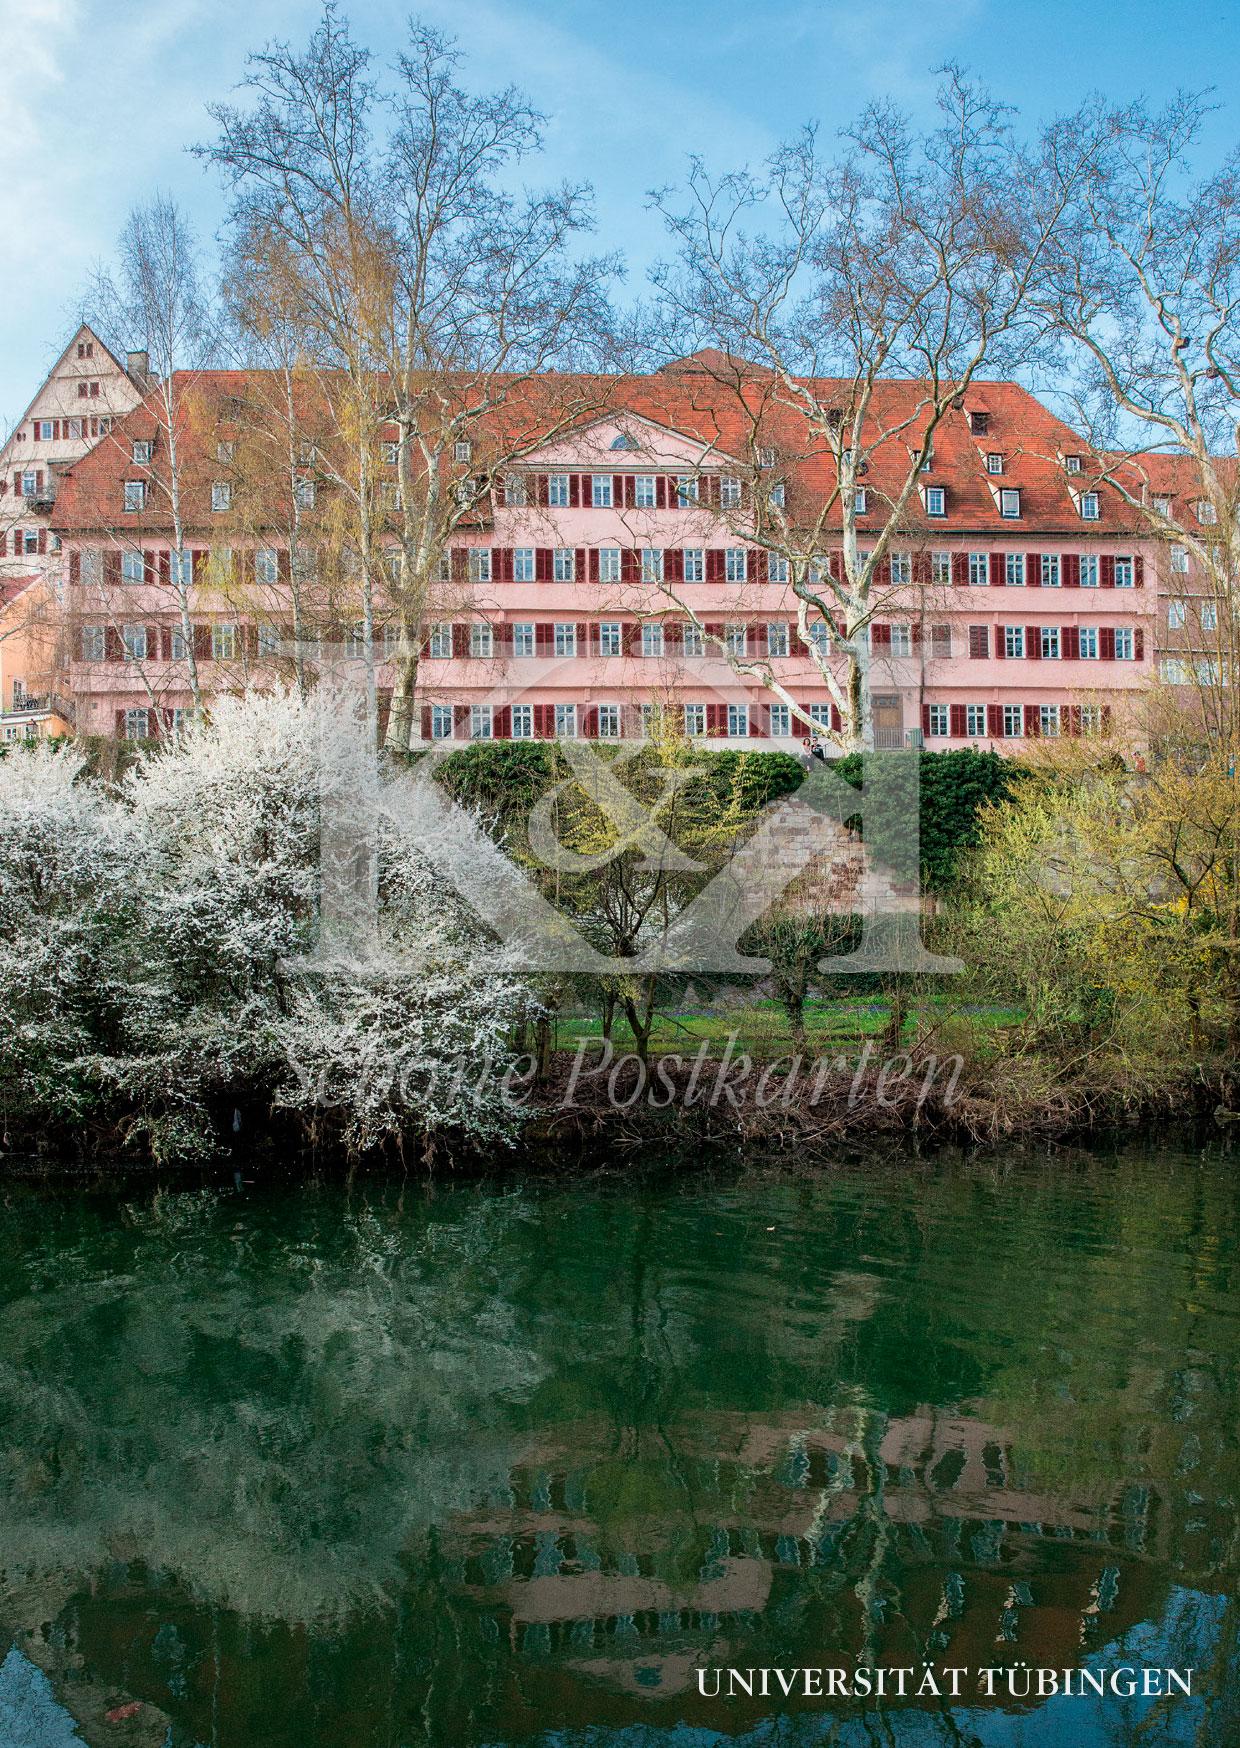 Schöne Postkarte Nr. 255 · Burse am Neckar, Universität Tübingen © 2018